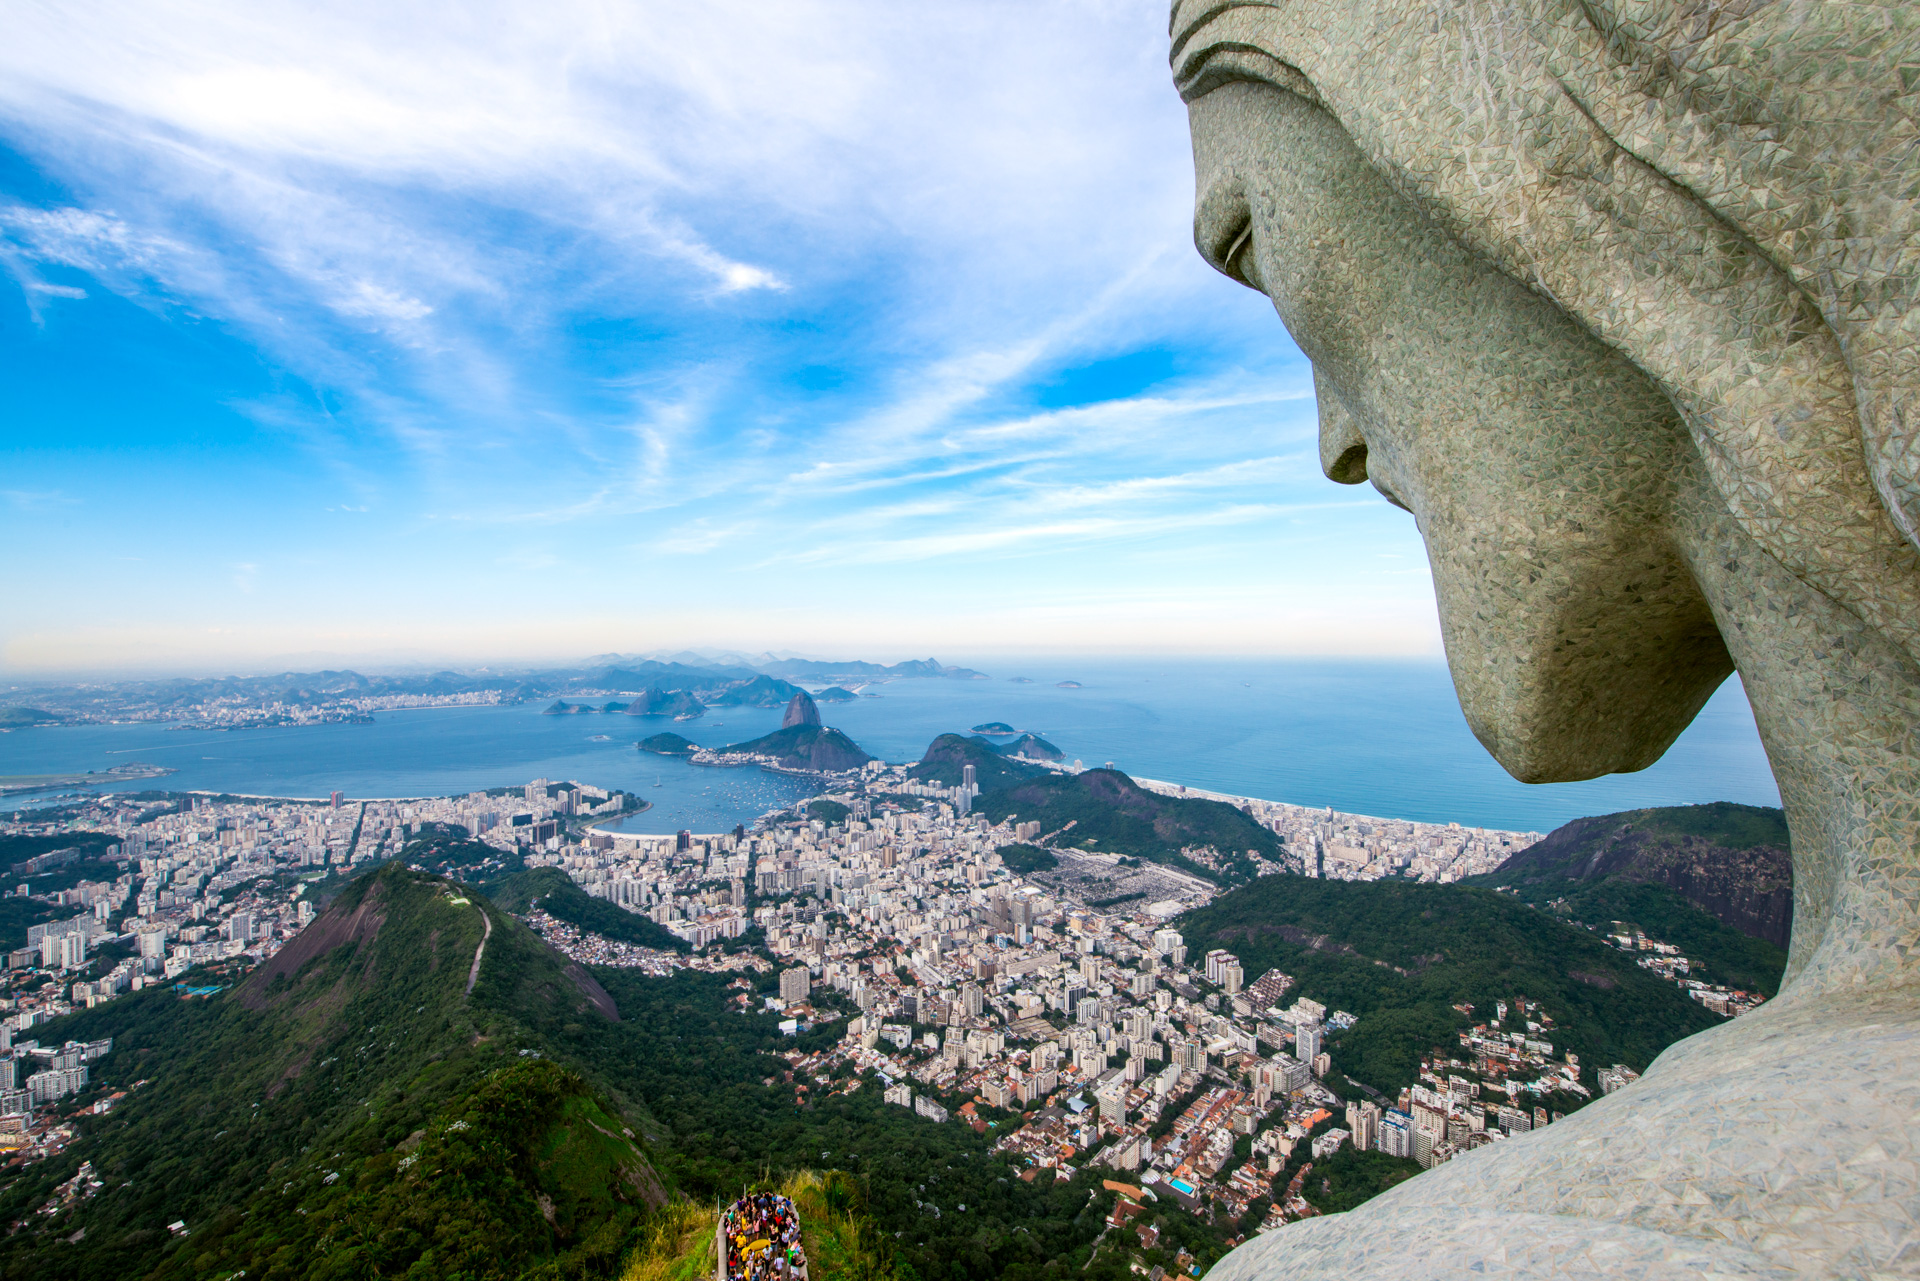 Cristo Redentor Ensaio. Rio de Janeiro, 18 de Julho 2014.